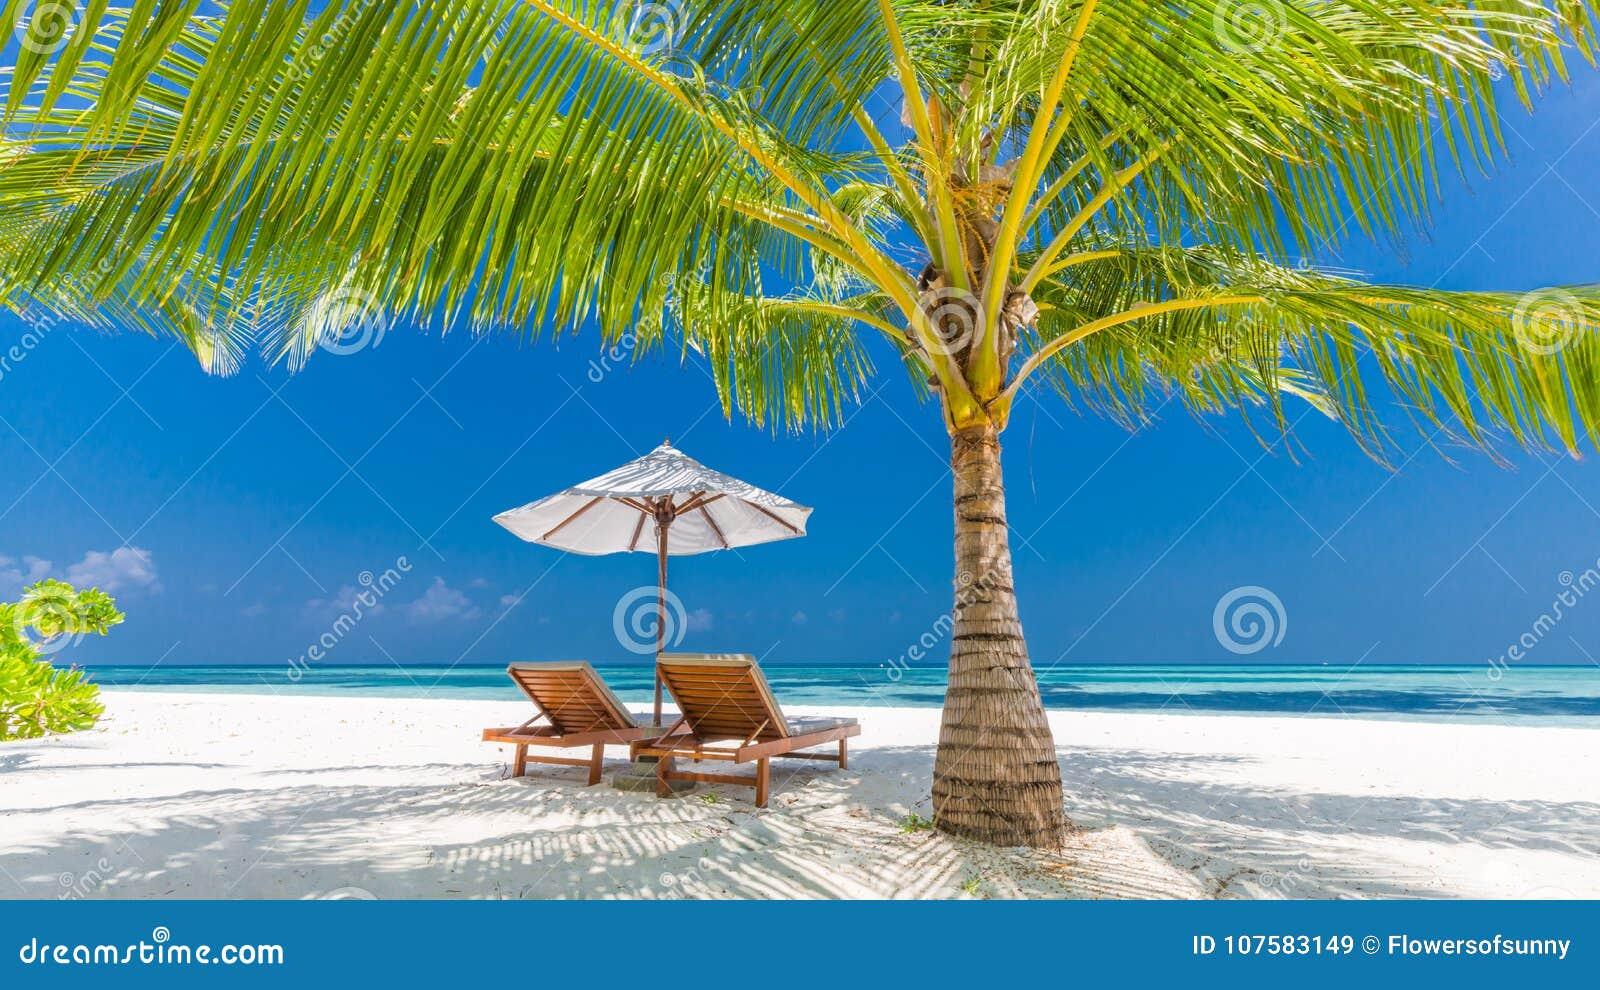 Beautiful Beach Banner Tropical Nature Scene Palm Trees